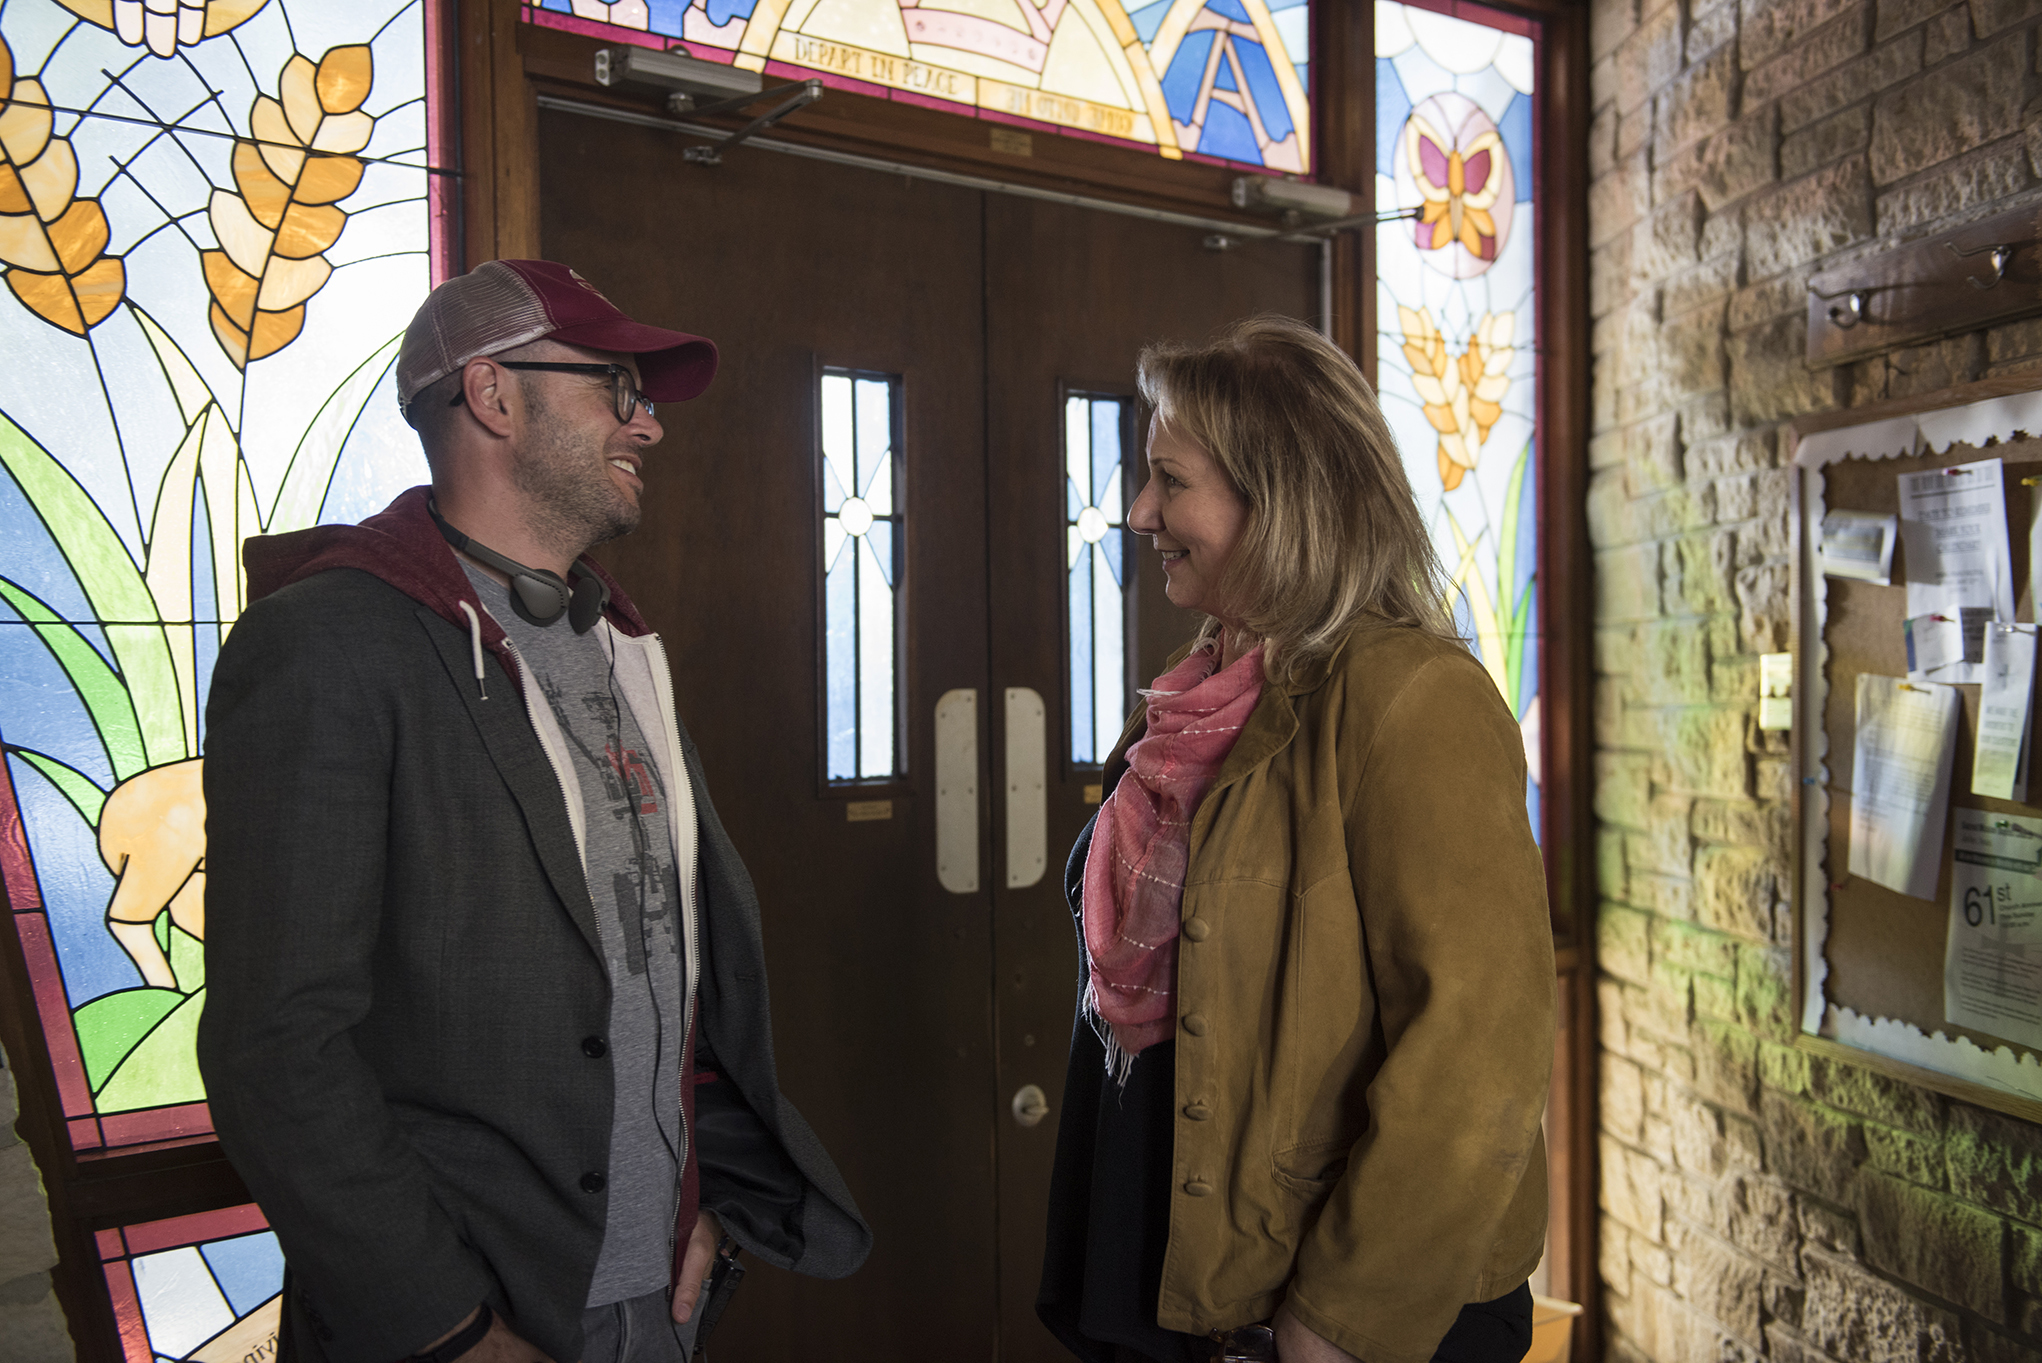 Damon Lindelof and Mimi Leder filming 'The Leftovers' Season 3